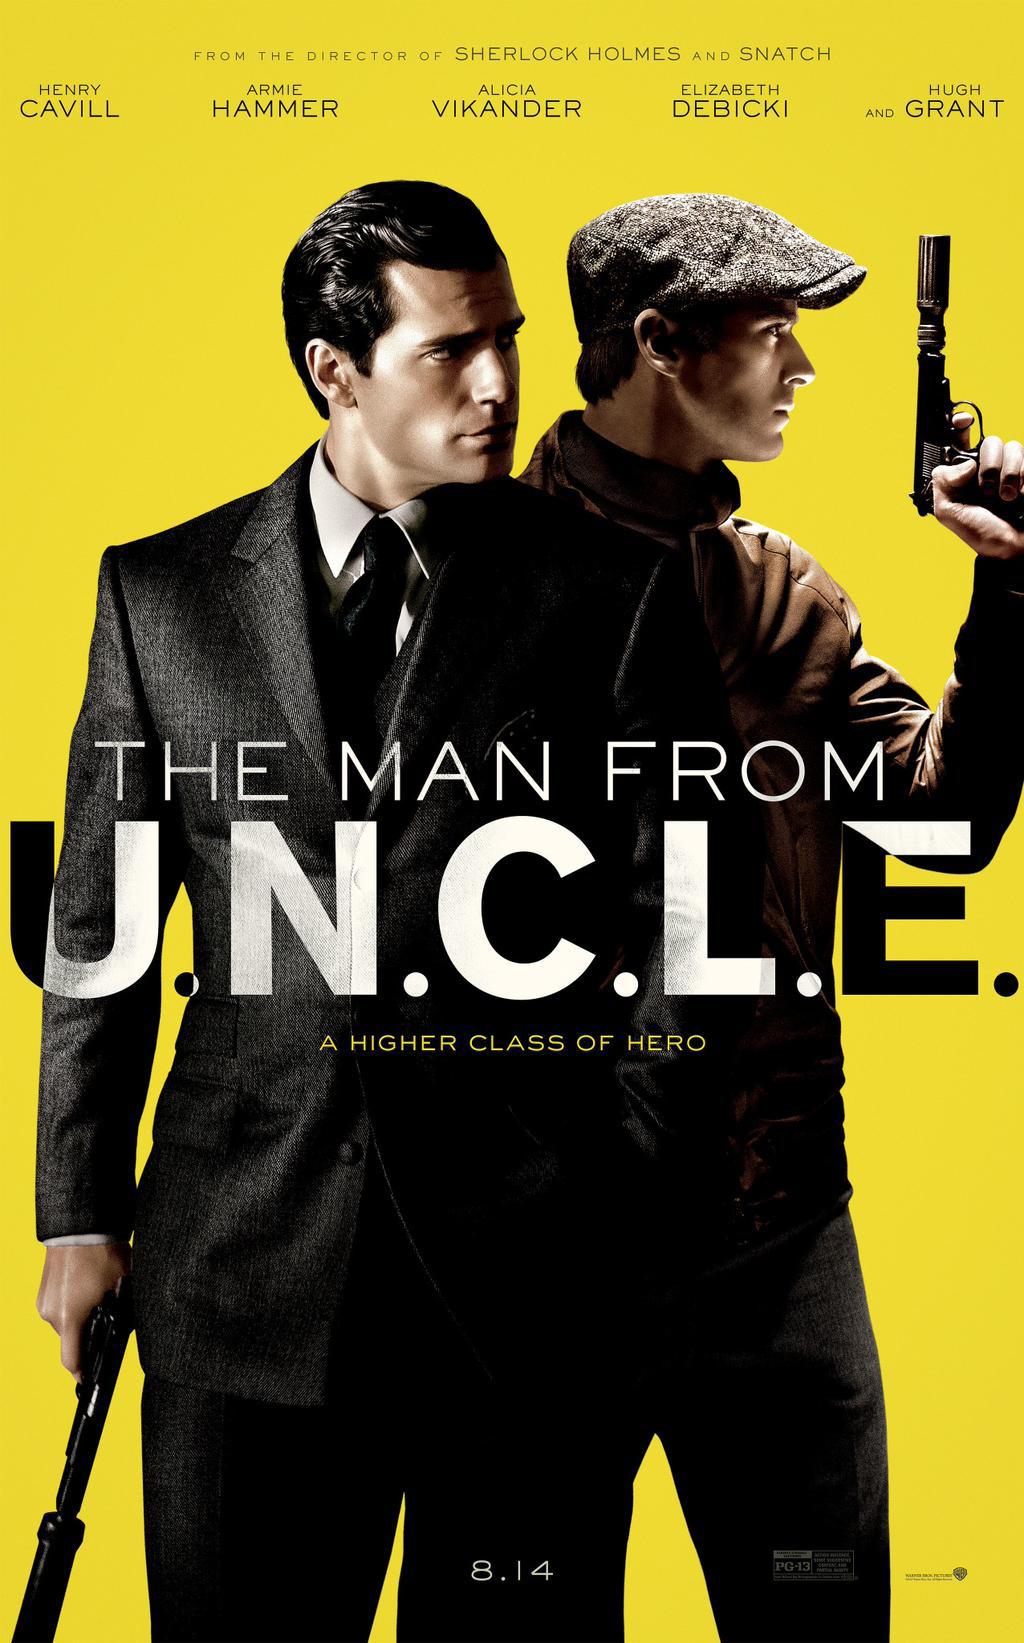 Agents très spéciaux - Code U.N.C.L.E : les espions cools en vidéo